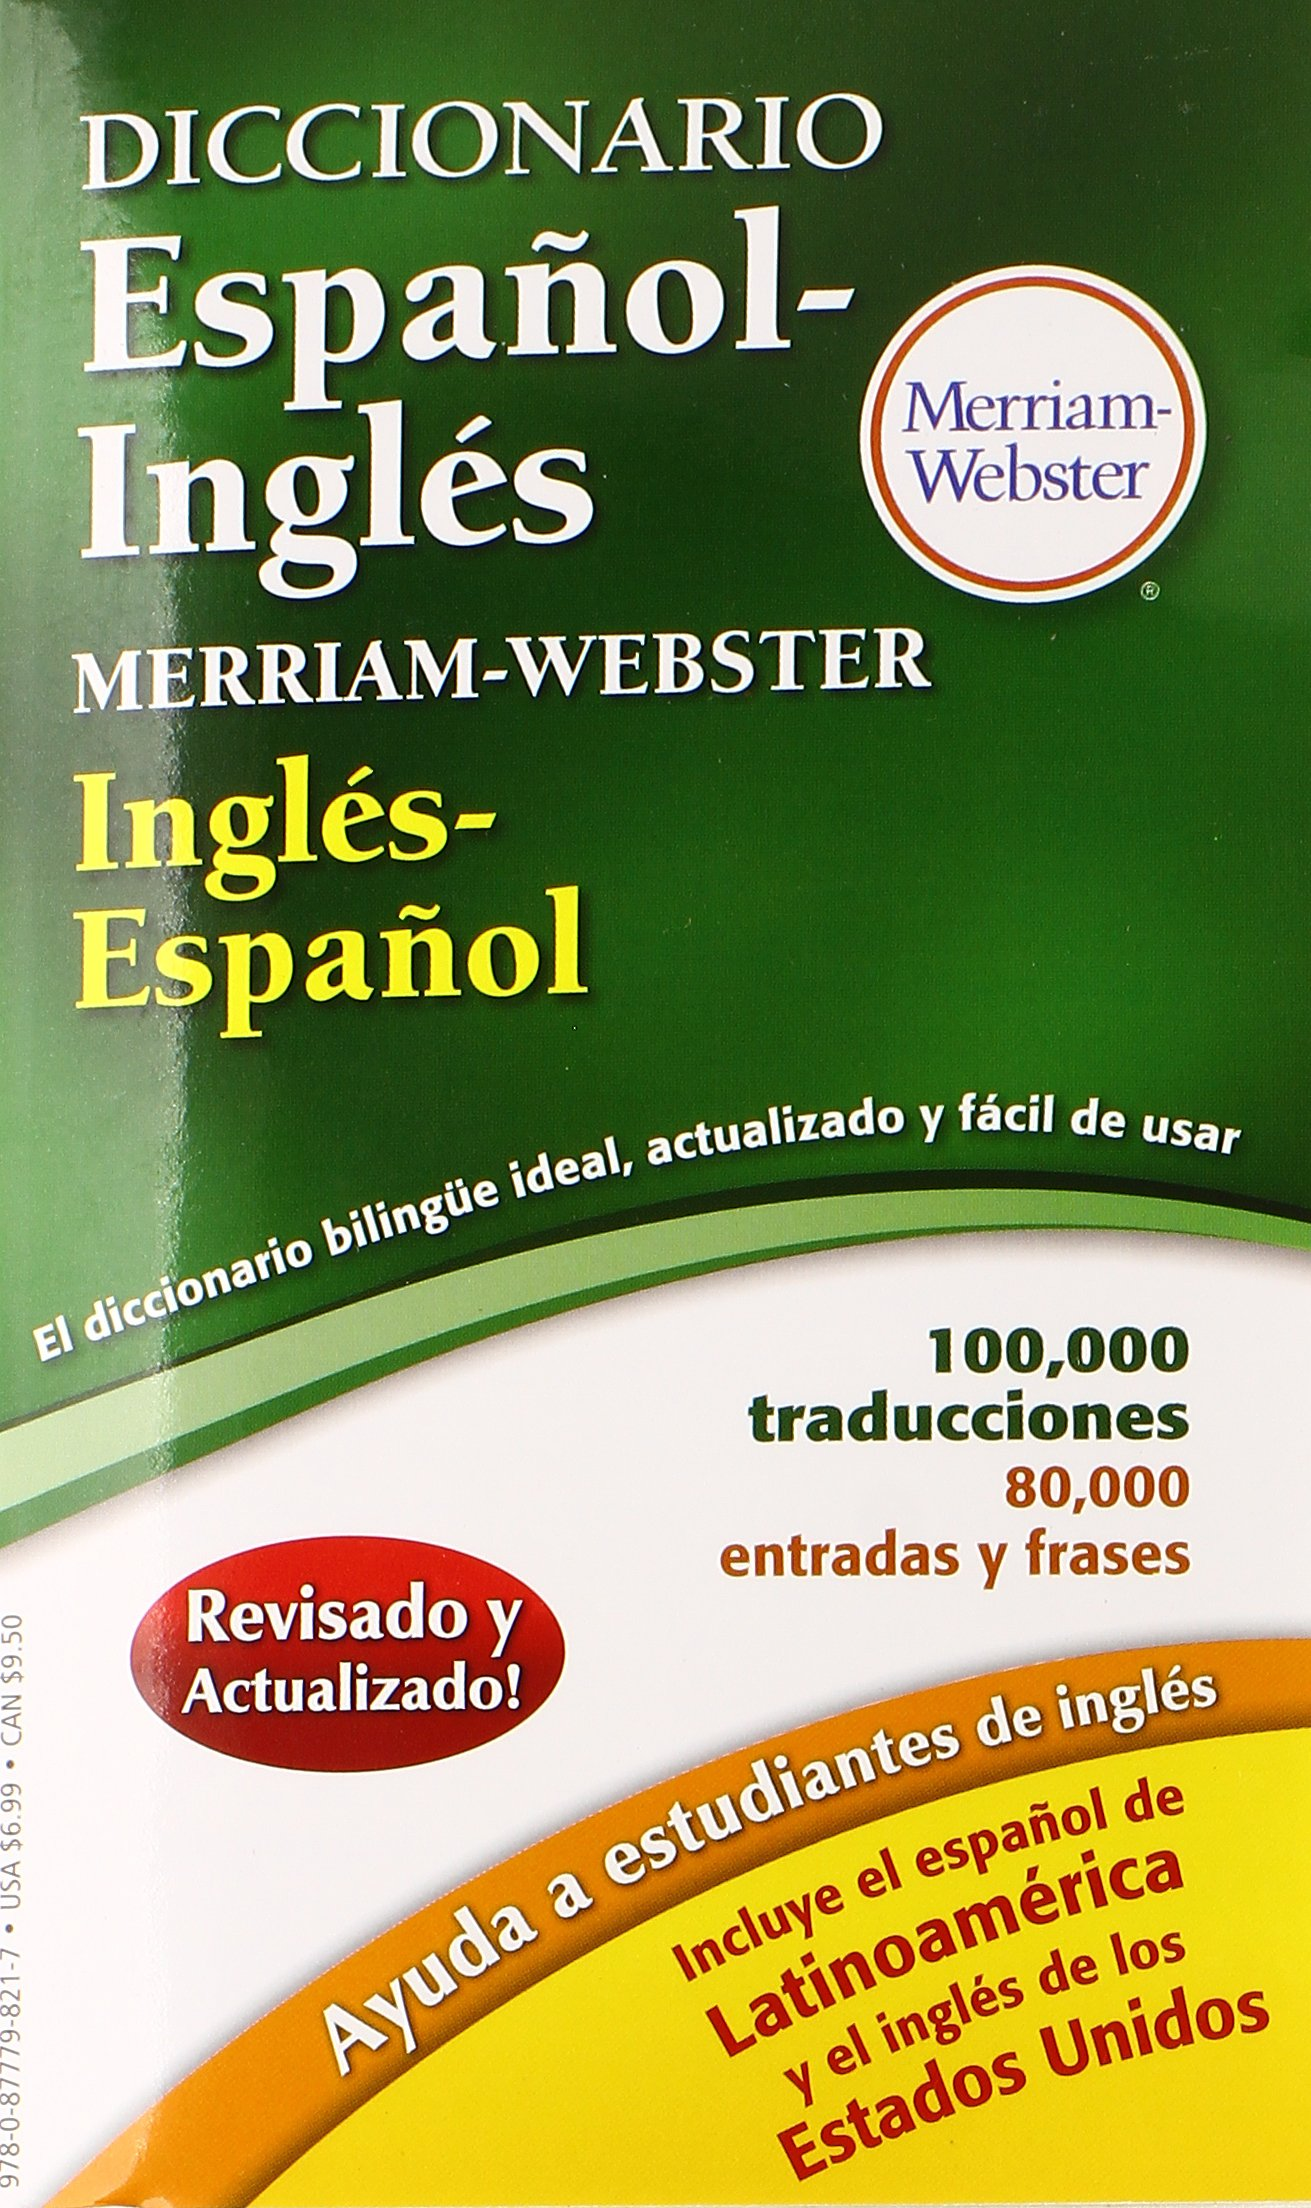 Diccionario Espanol-Ingles Merriam-Webster, New Edition, 2016 copyright ( Spanish and English Edition): Merriam-Webster, Inc.: 9780877798217:  Amazon.com: ...